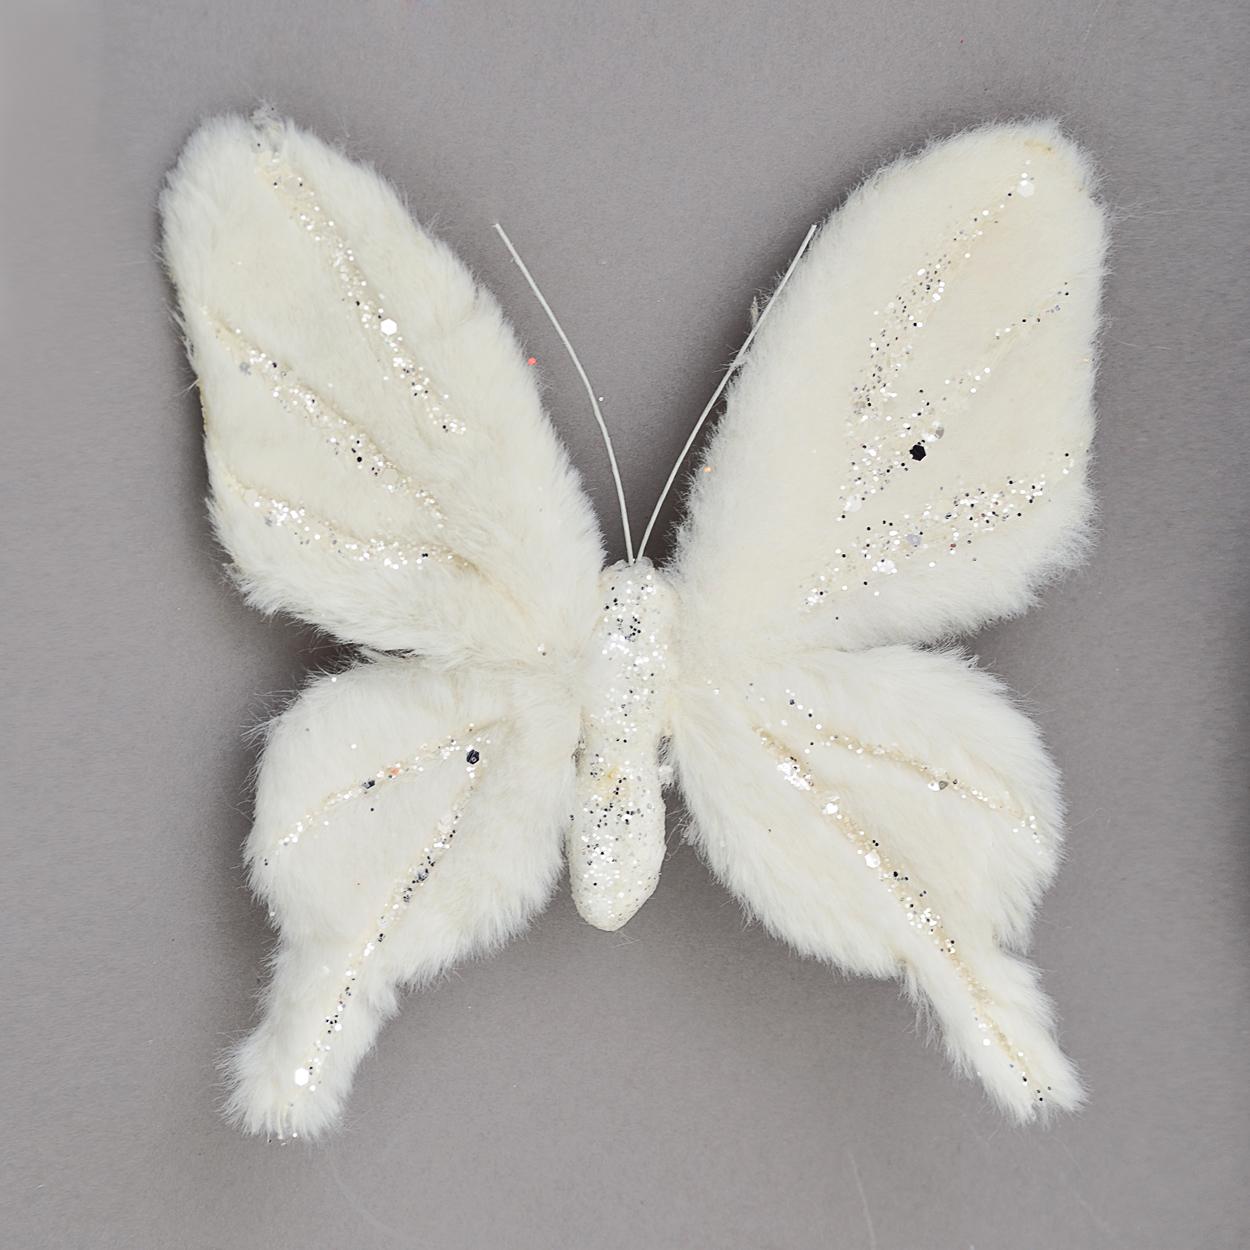 Бабочка Yes! Fun пушистая кремово-белая с декором, 20*20 см